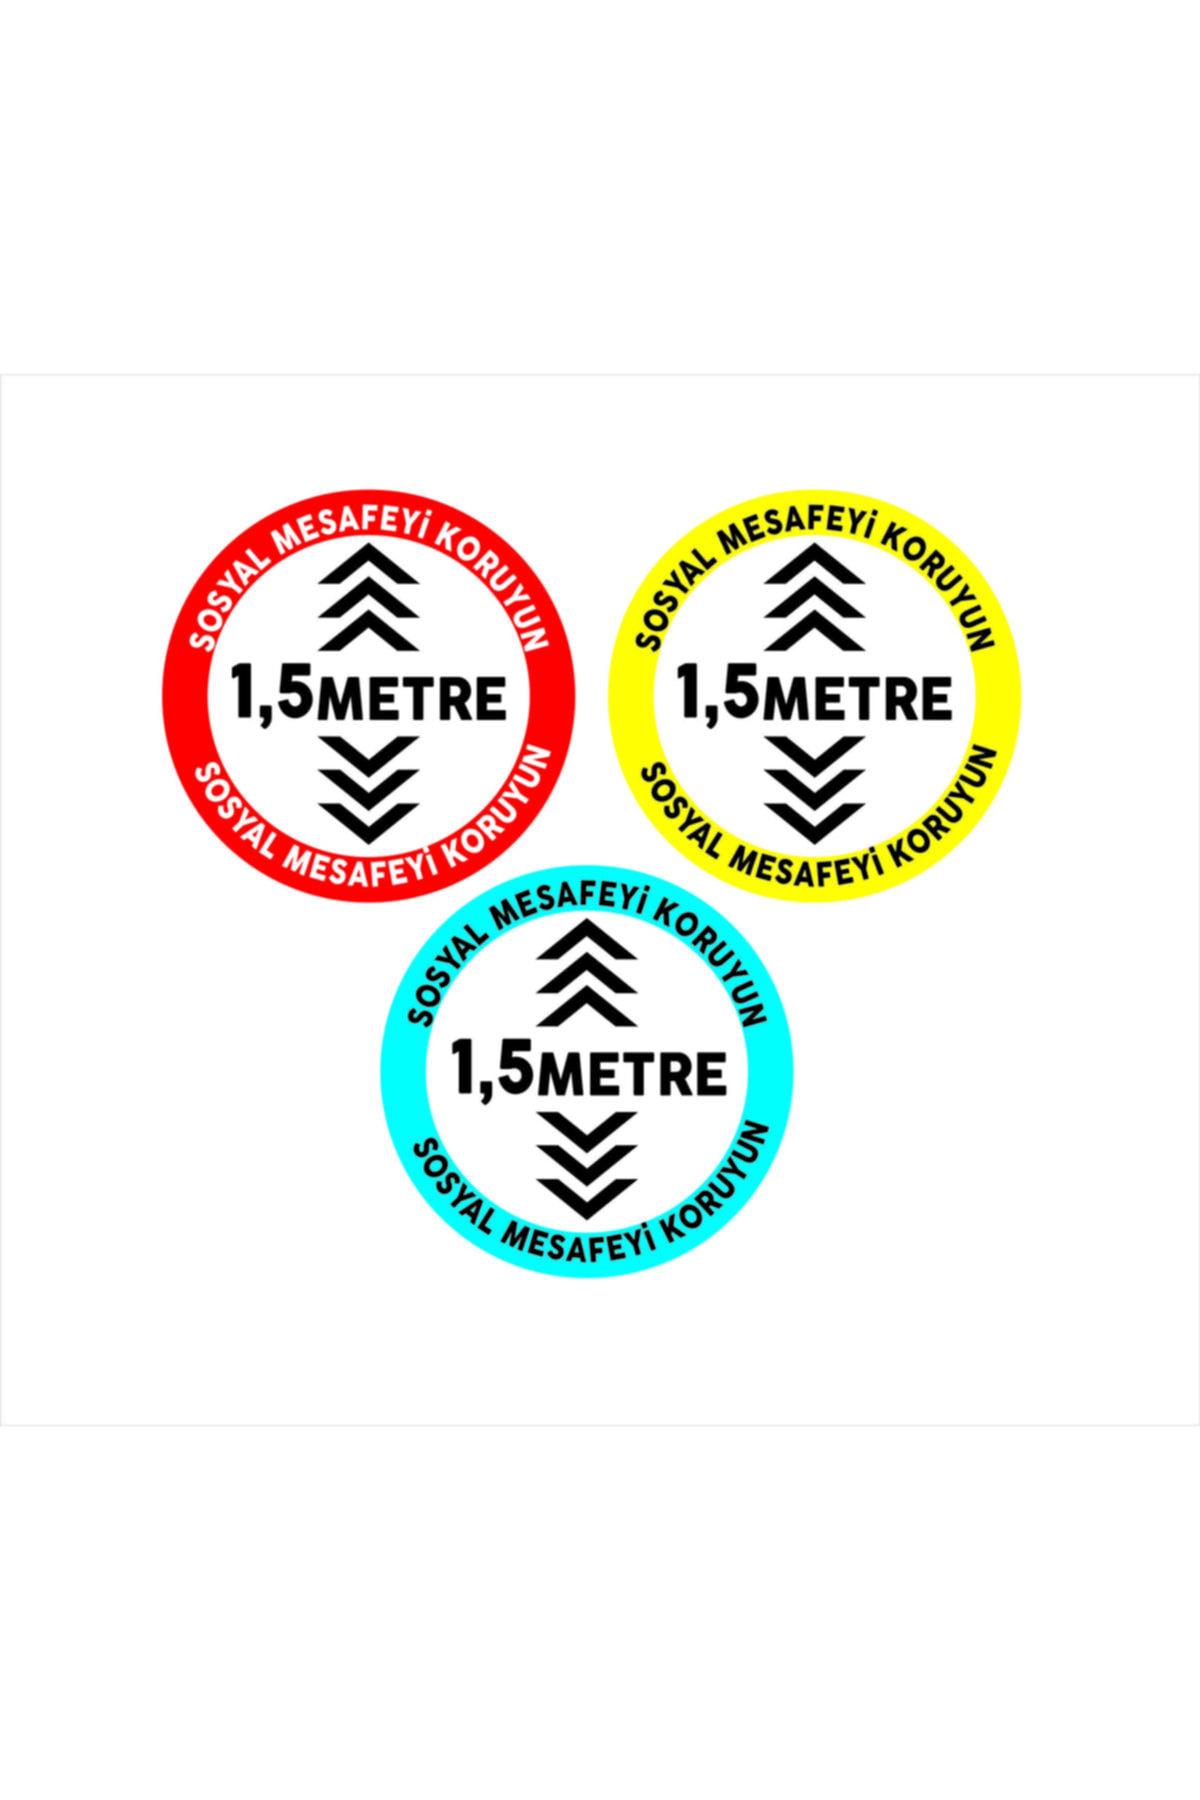 AKTİF AJANS Sosyal Mesafe Zemin Etiket Sticker, Zemin, Folyo Set Daire 3 Lü Set 1